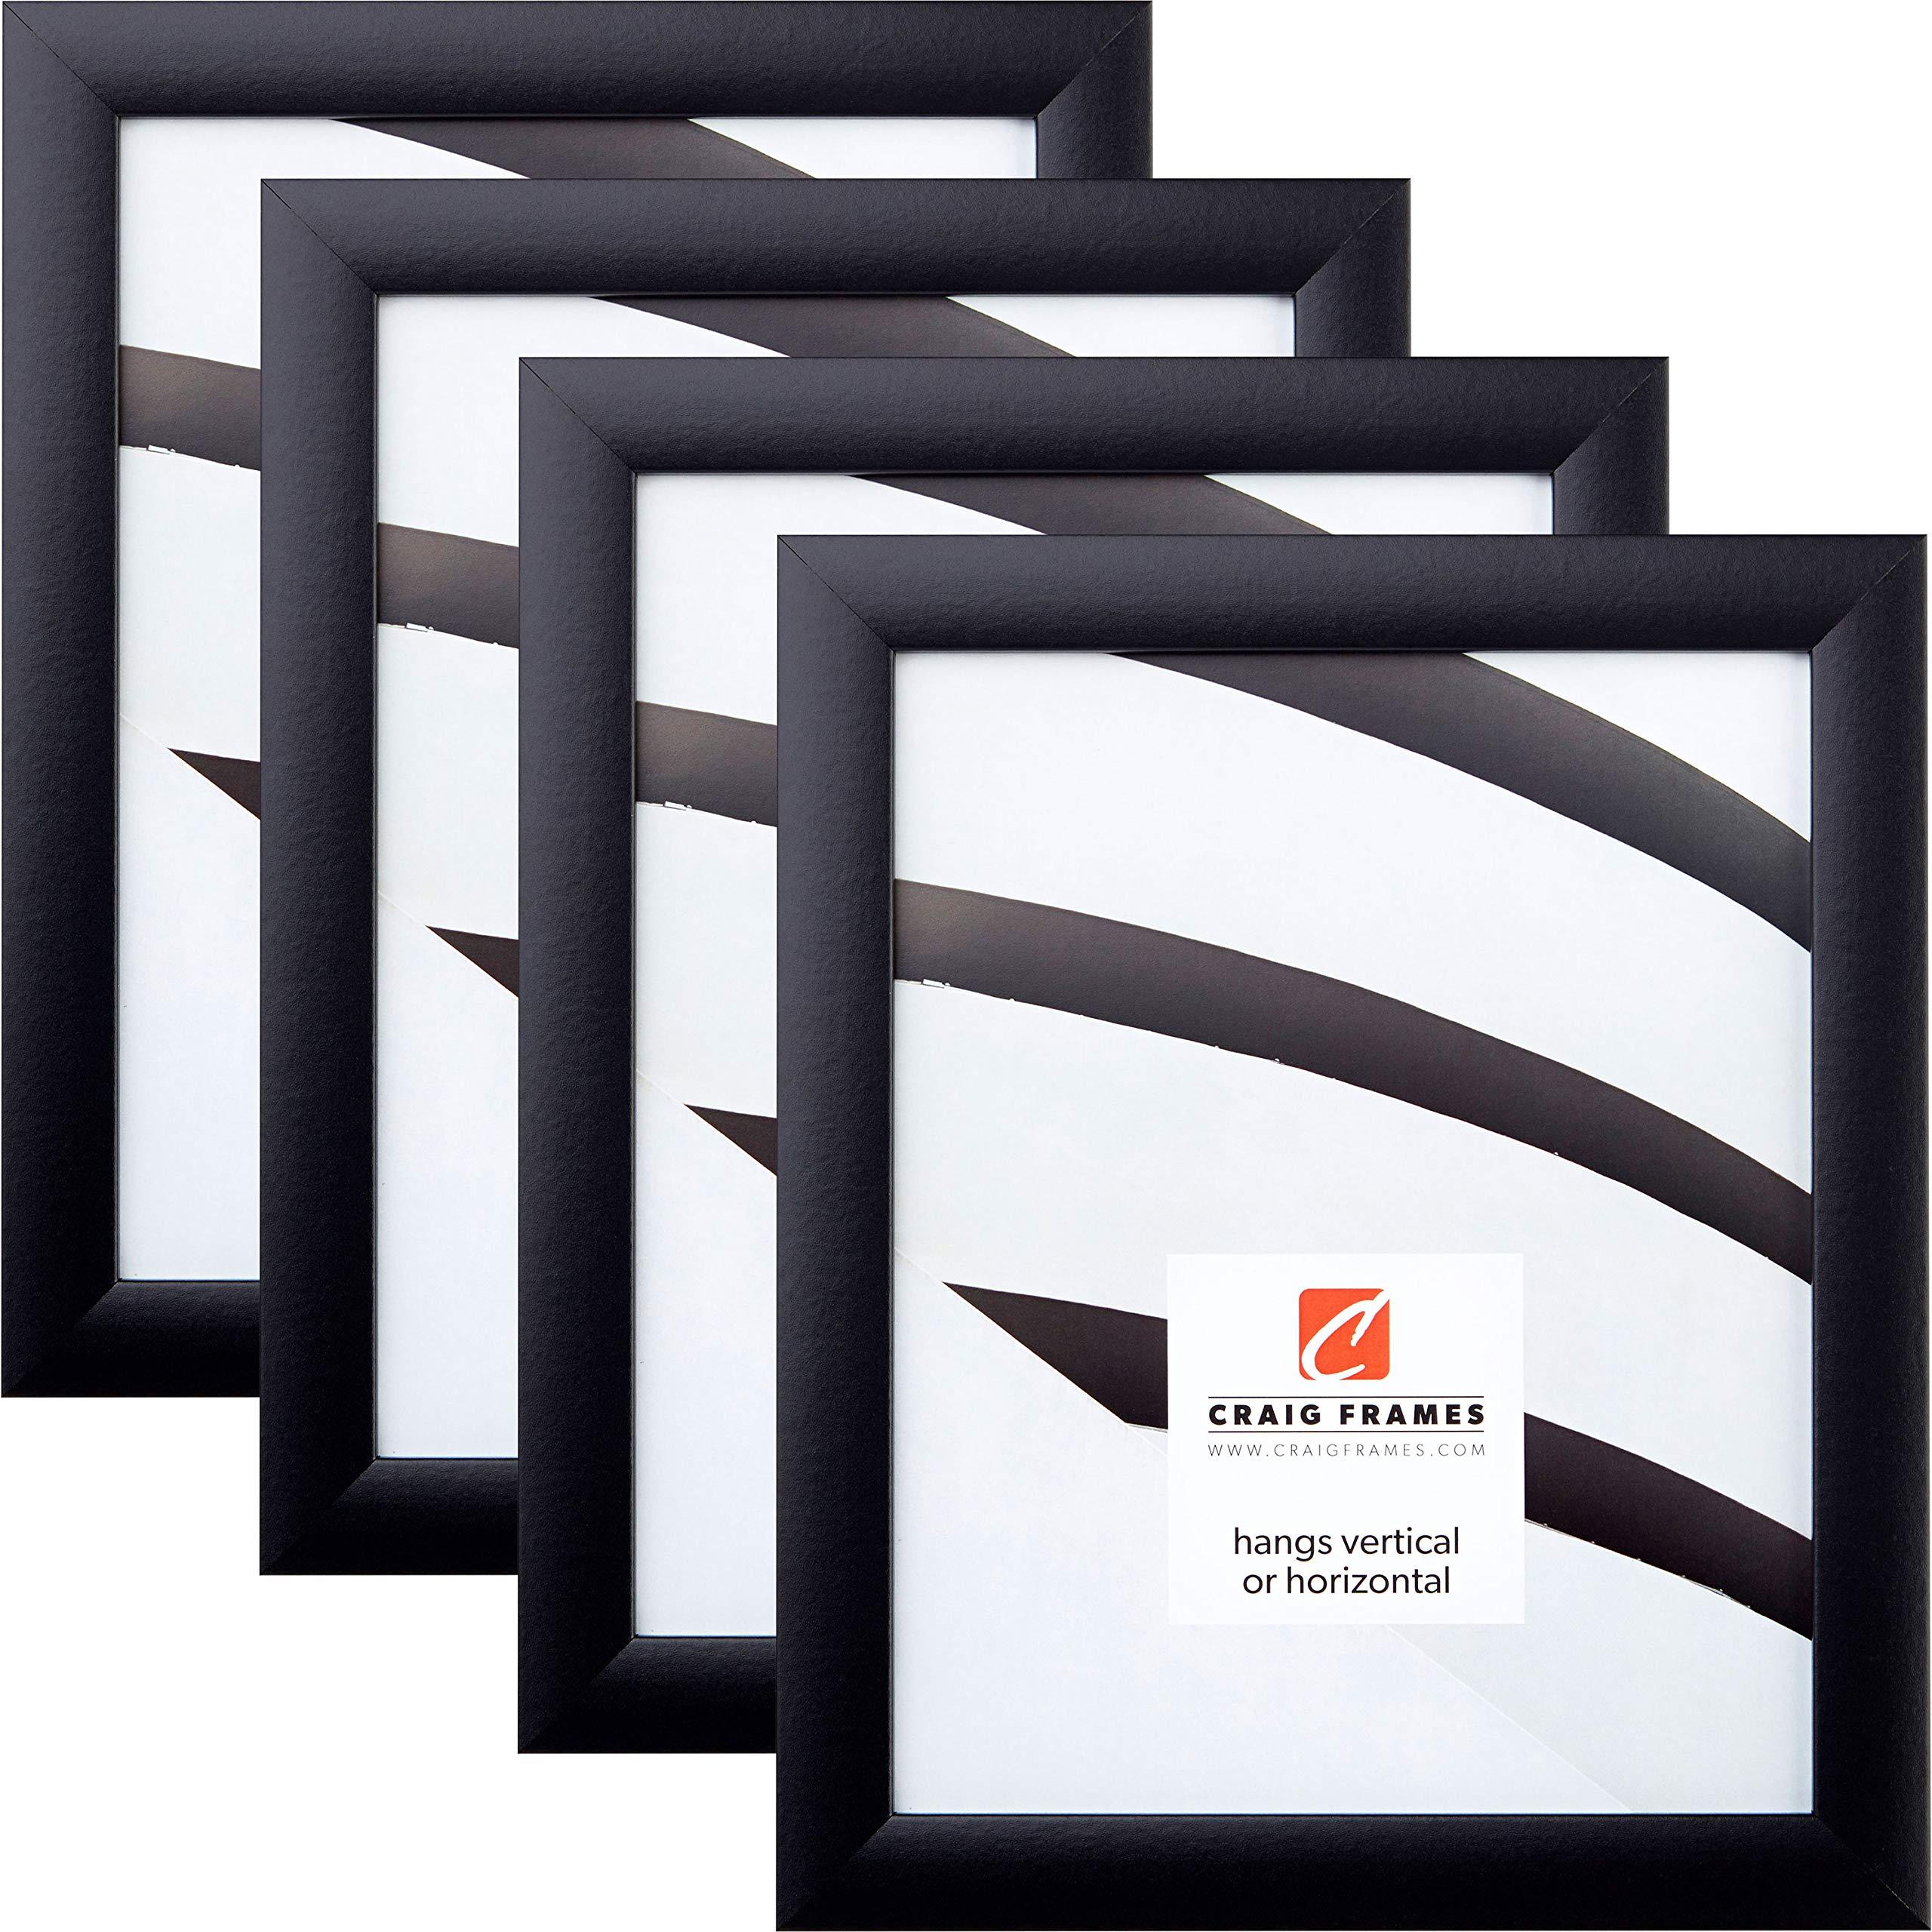 Craig Frames 1WB3BK 8 x 10 Inch Picture Frame, Black, Set of 4 by Craig Frames